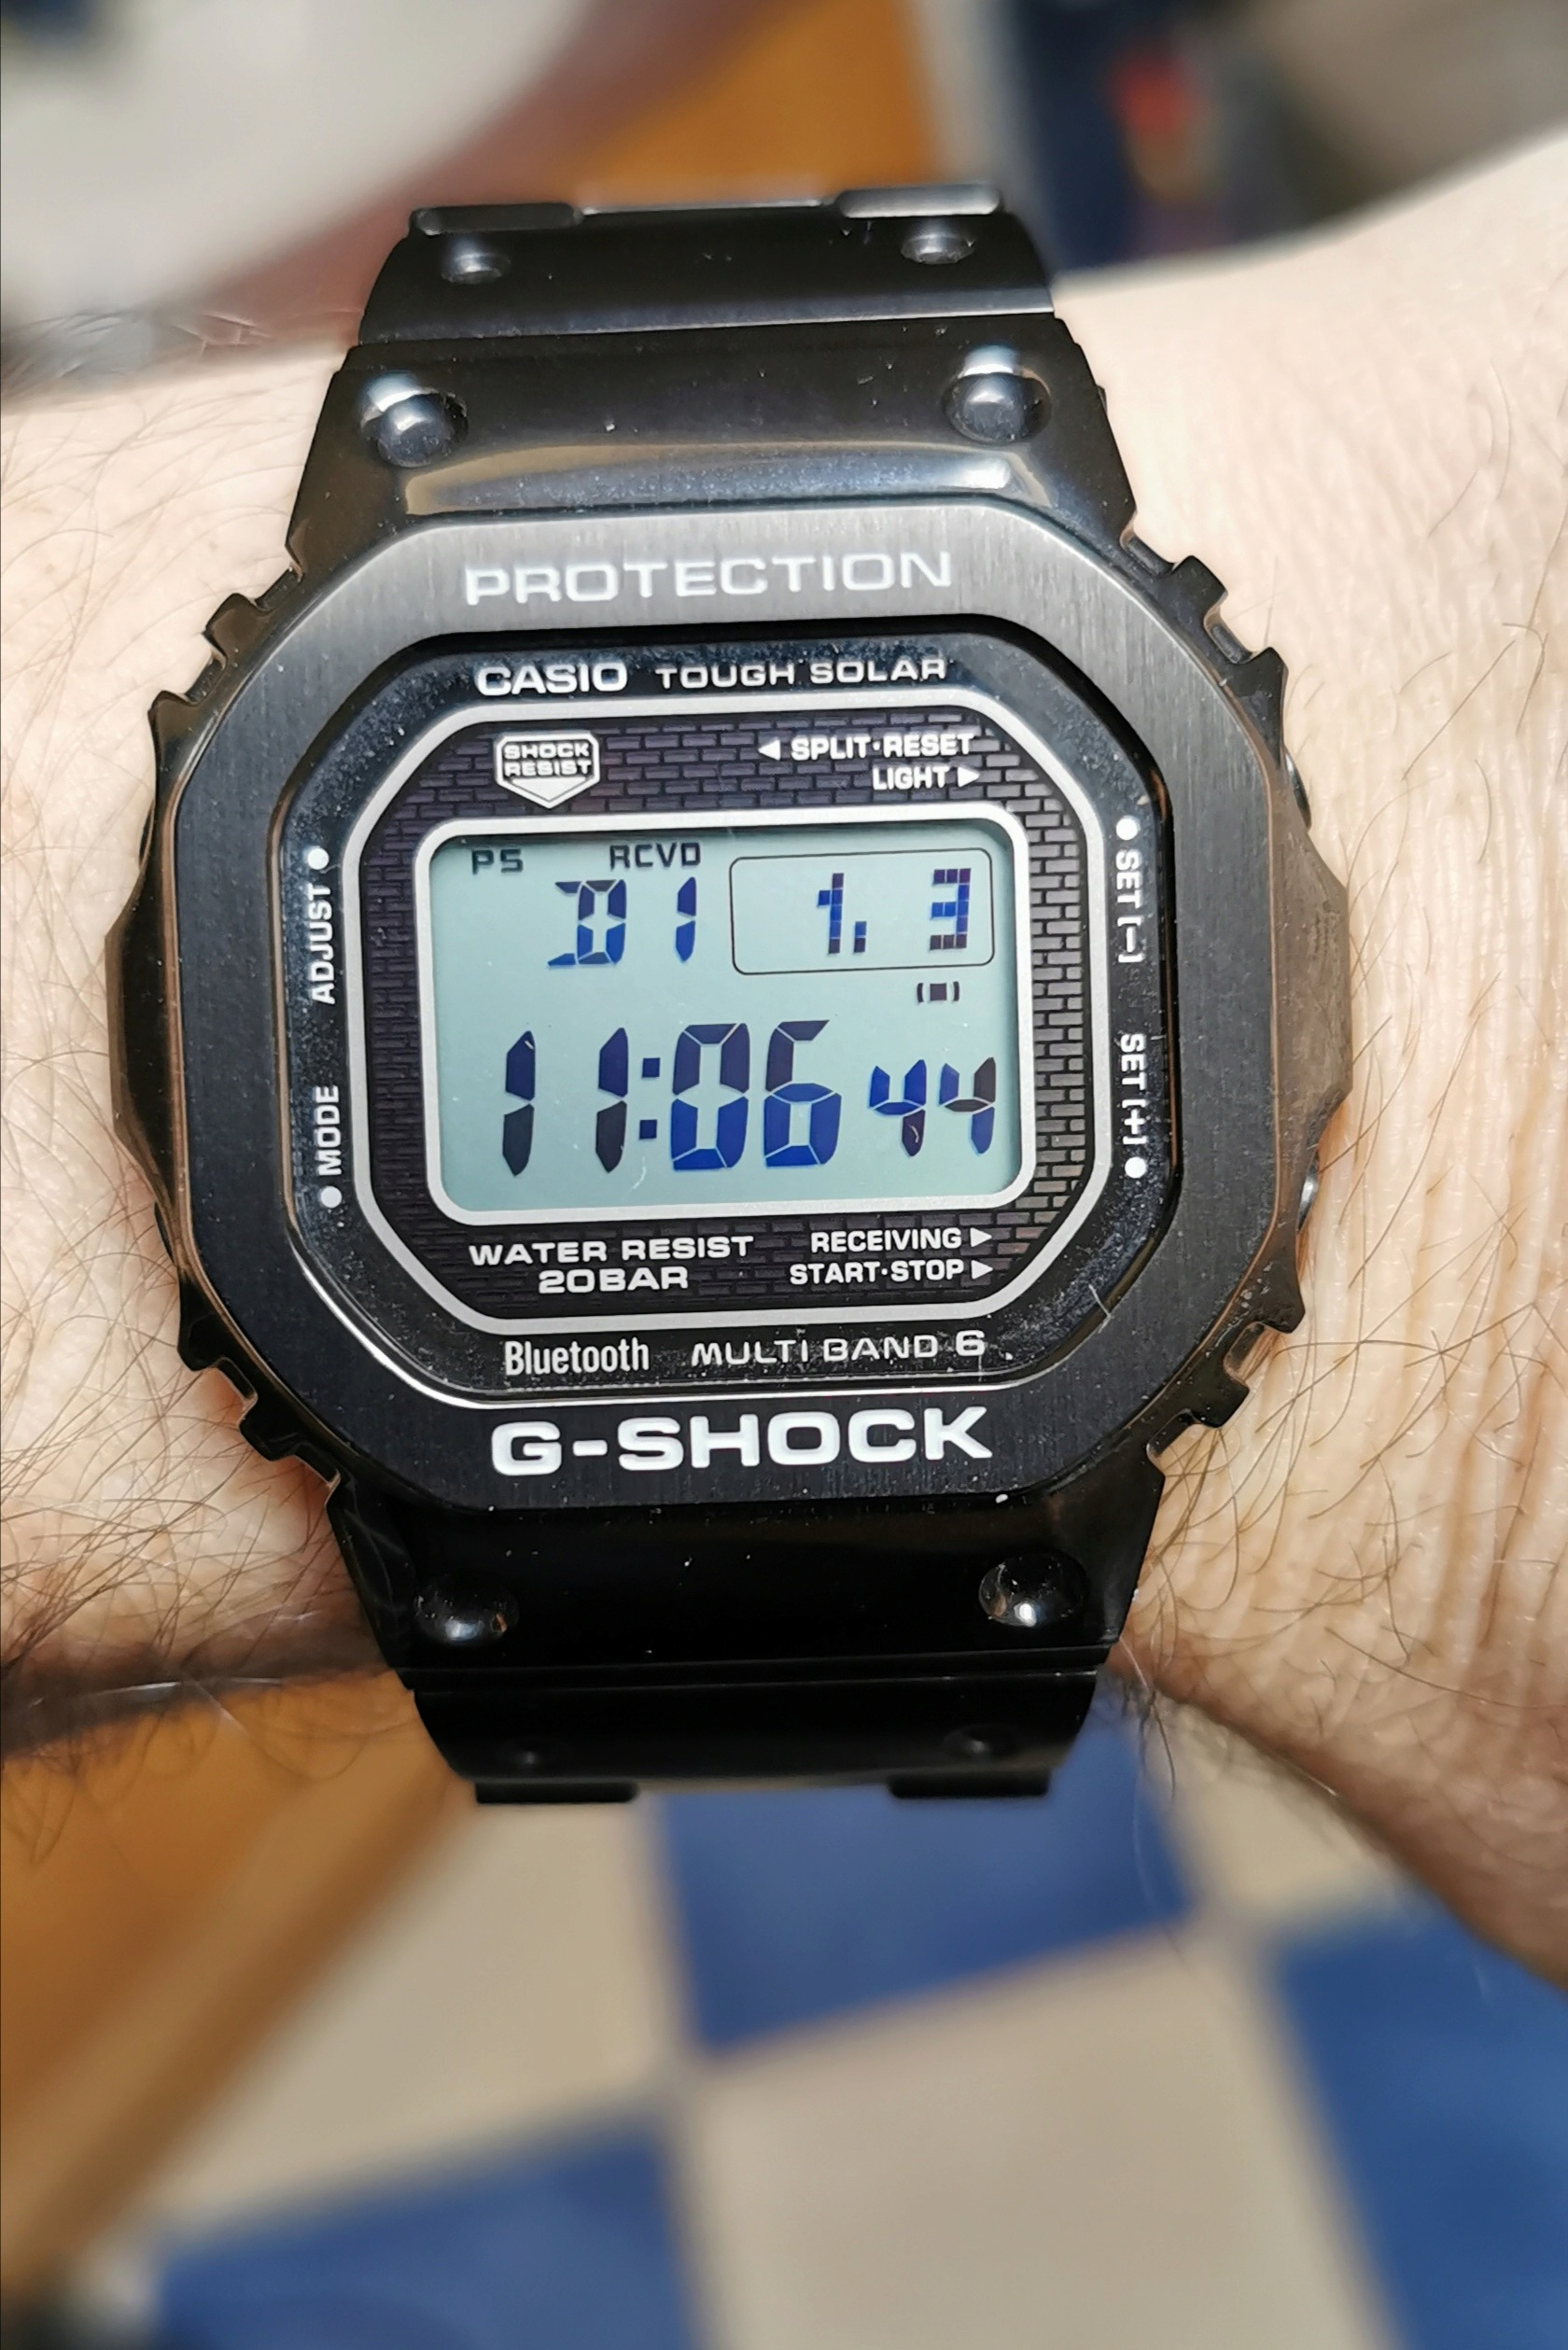 Feu de G-Shock - tome 3 - Page 12 Img_2330